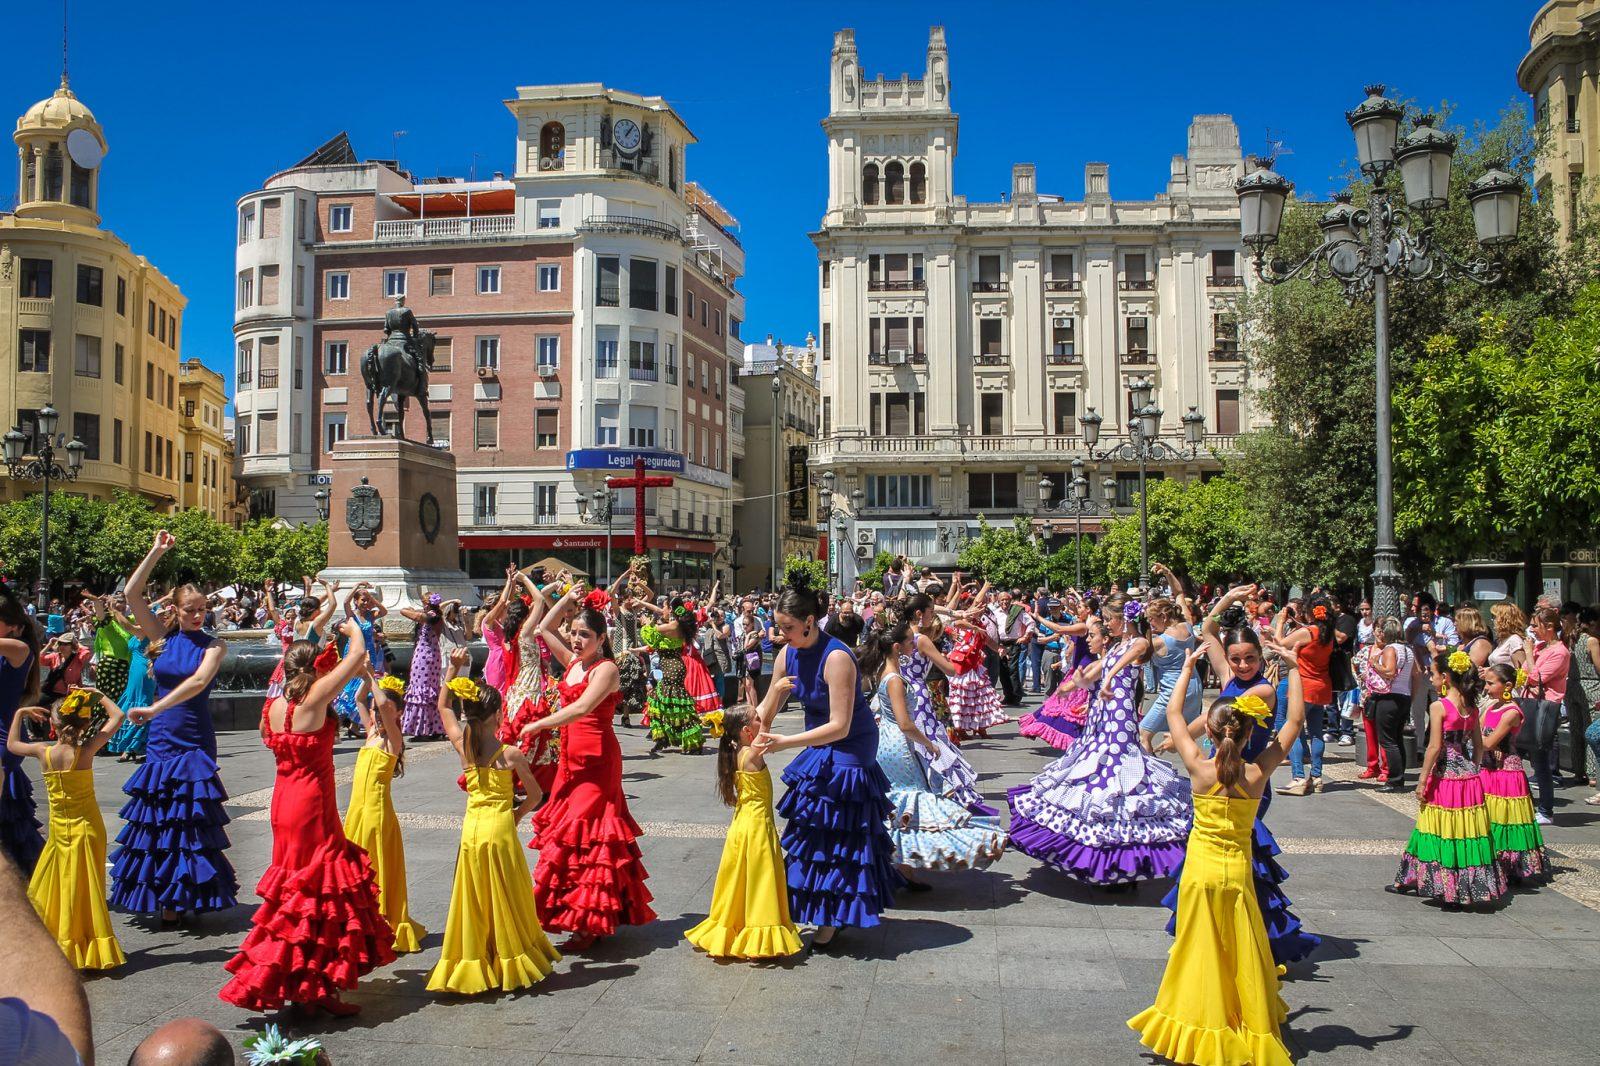 Все танцуют фламенко (фото: Errant Walker)